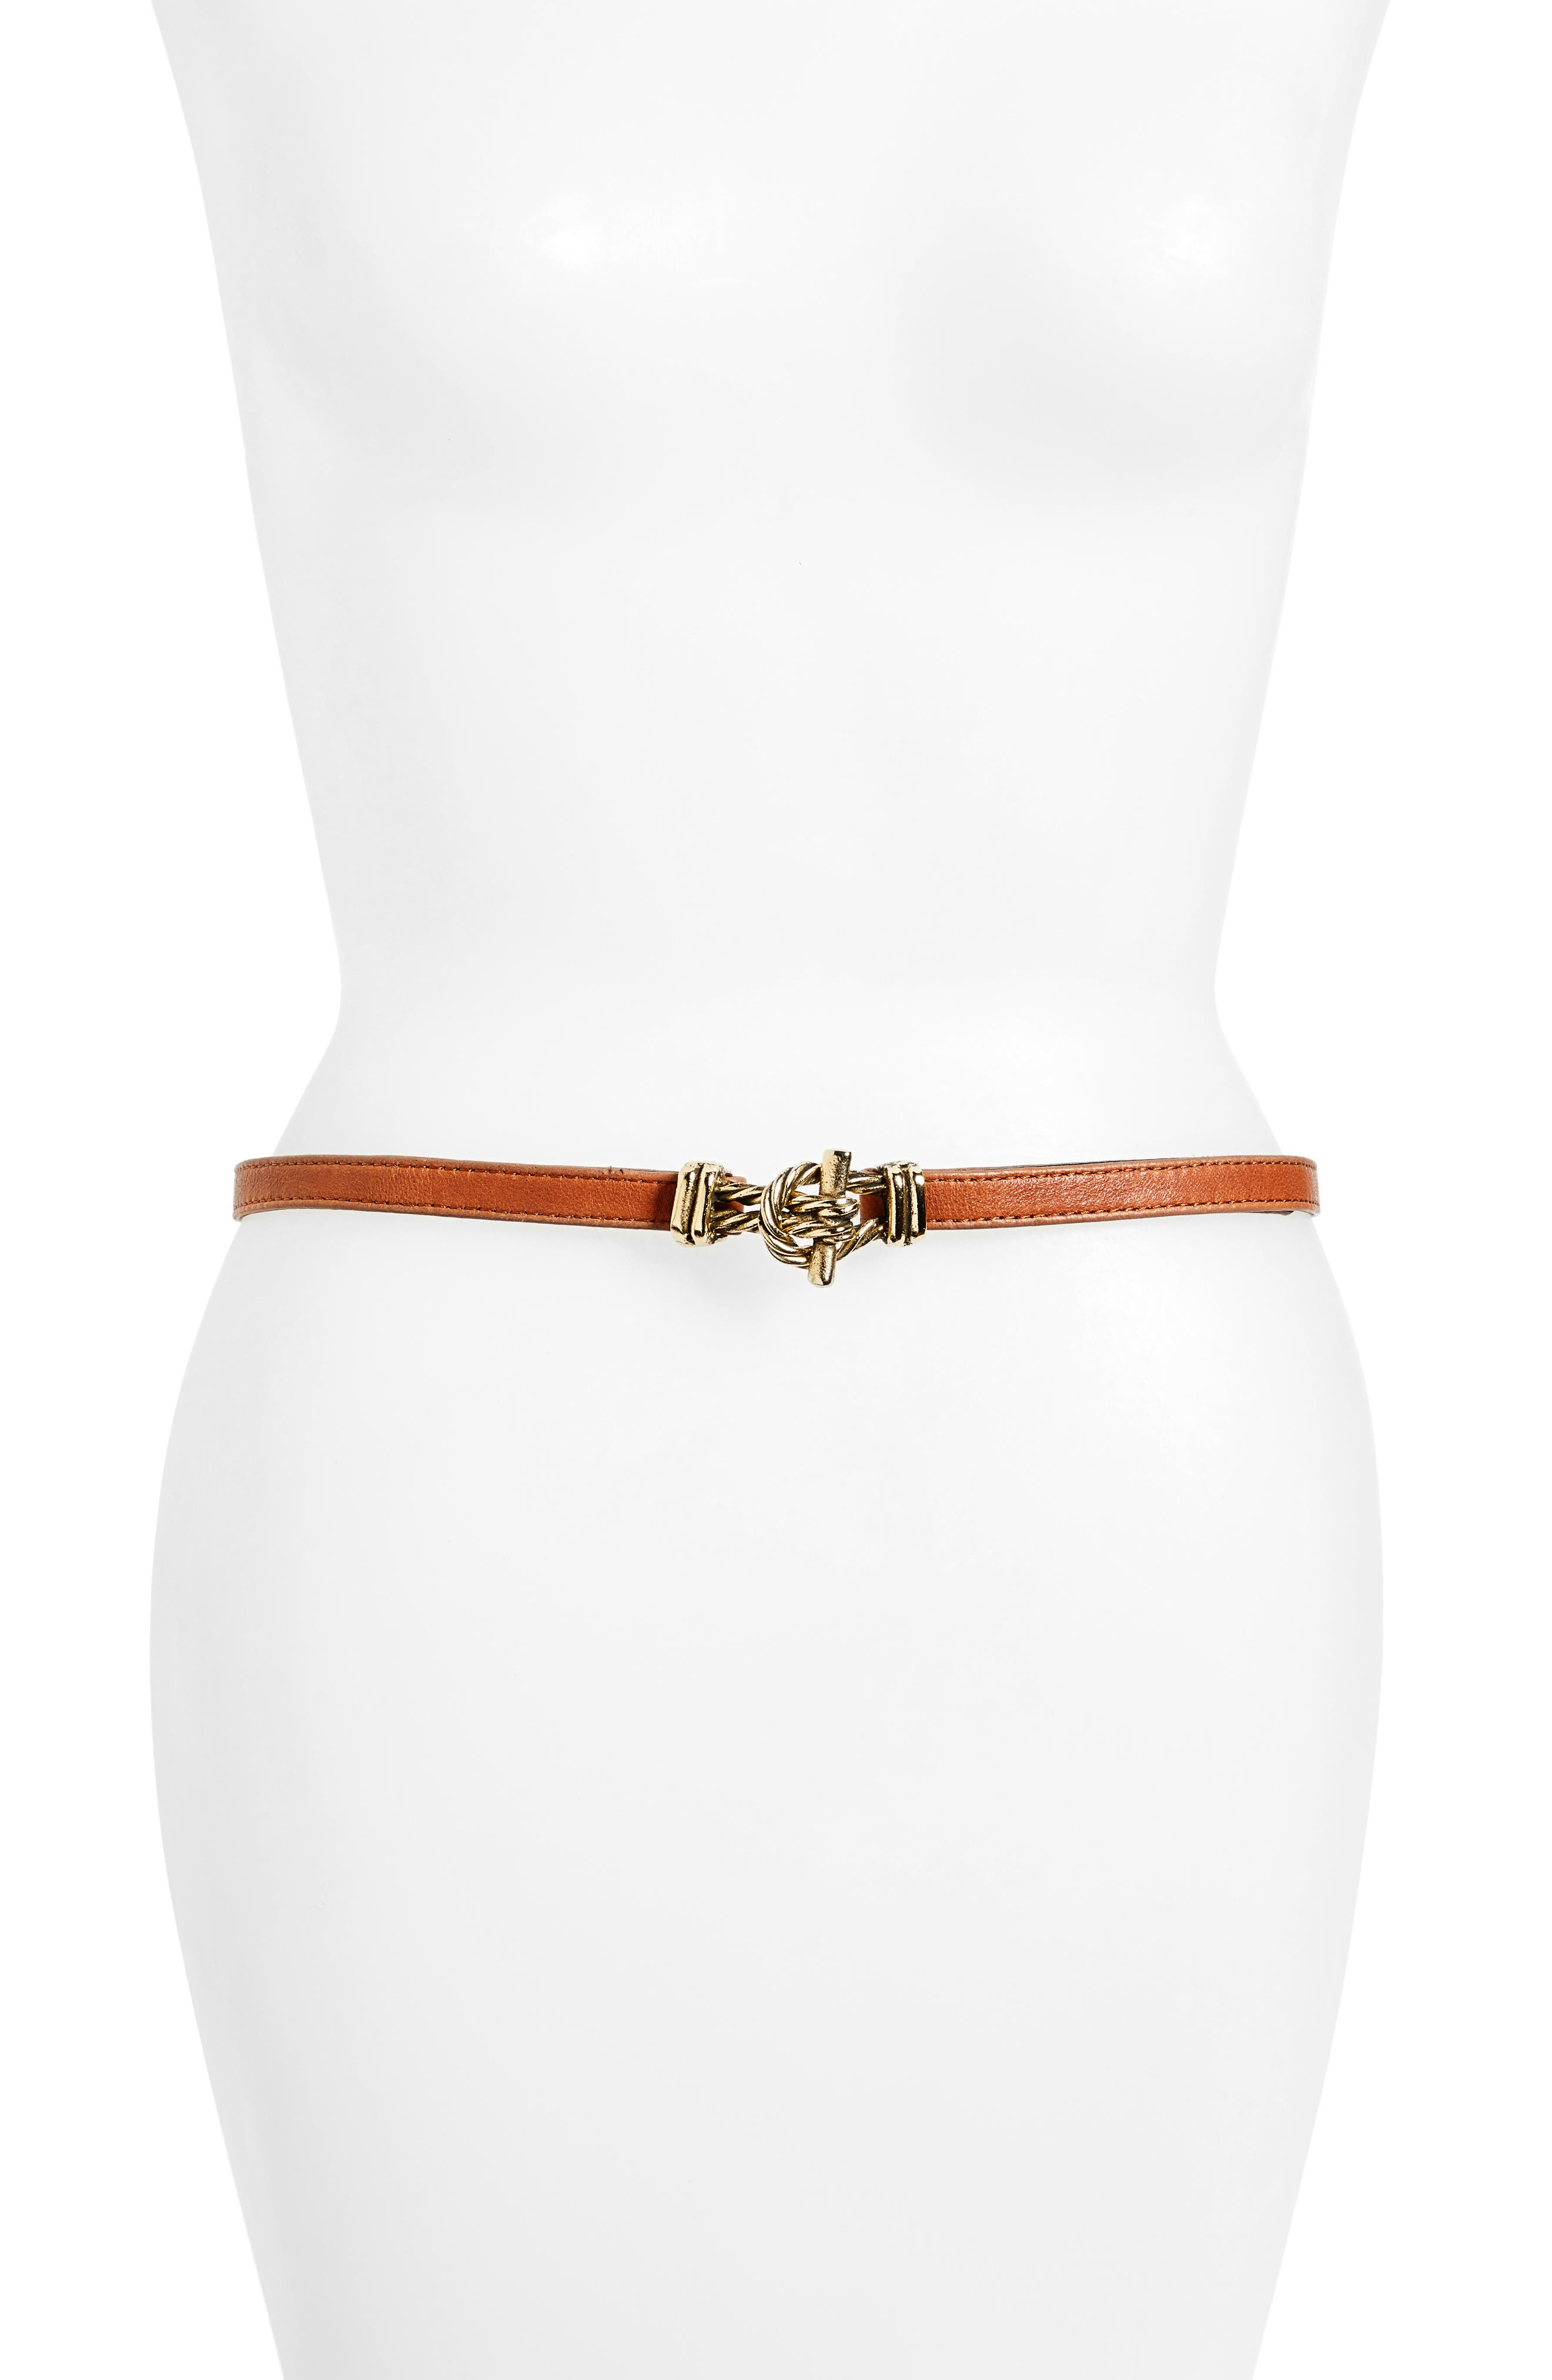 Raina Fitzgerald Leather Belt, Size One Size - Cognac